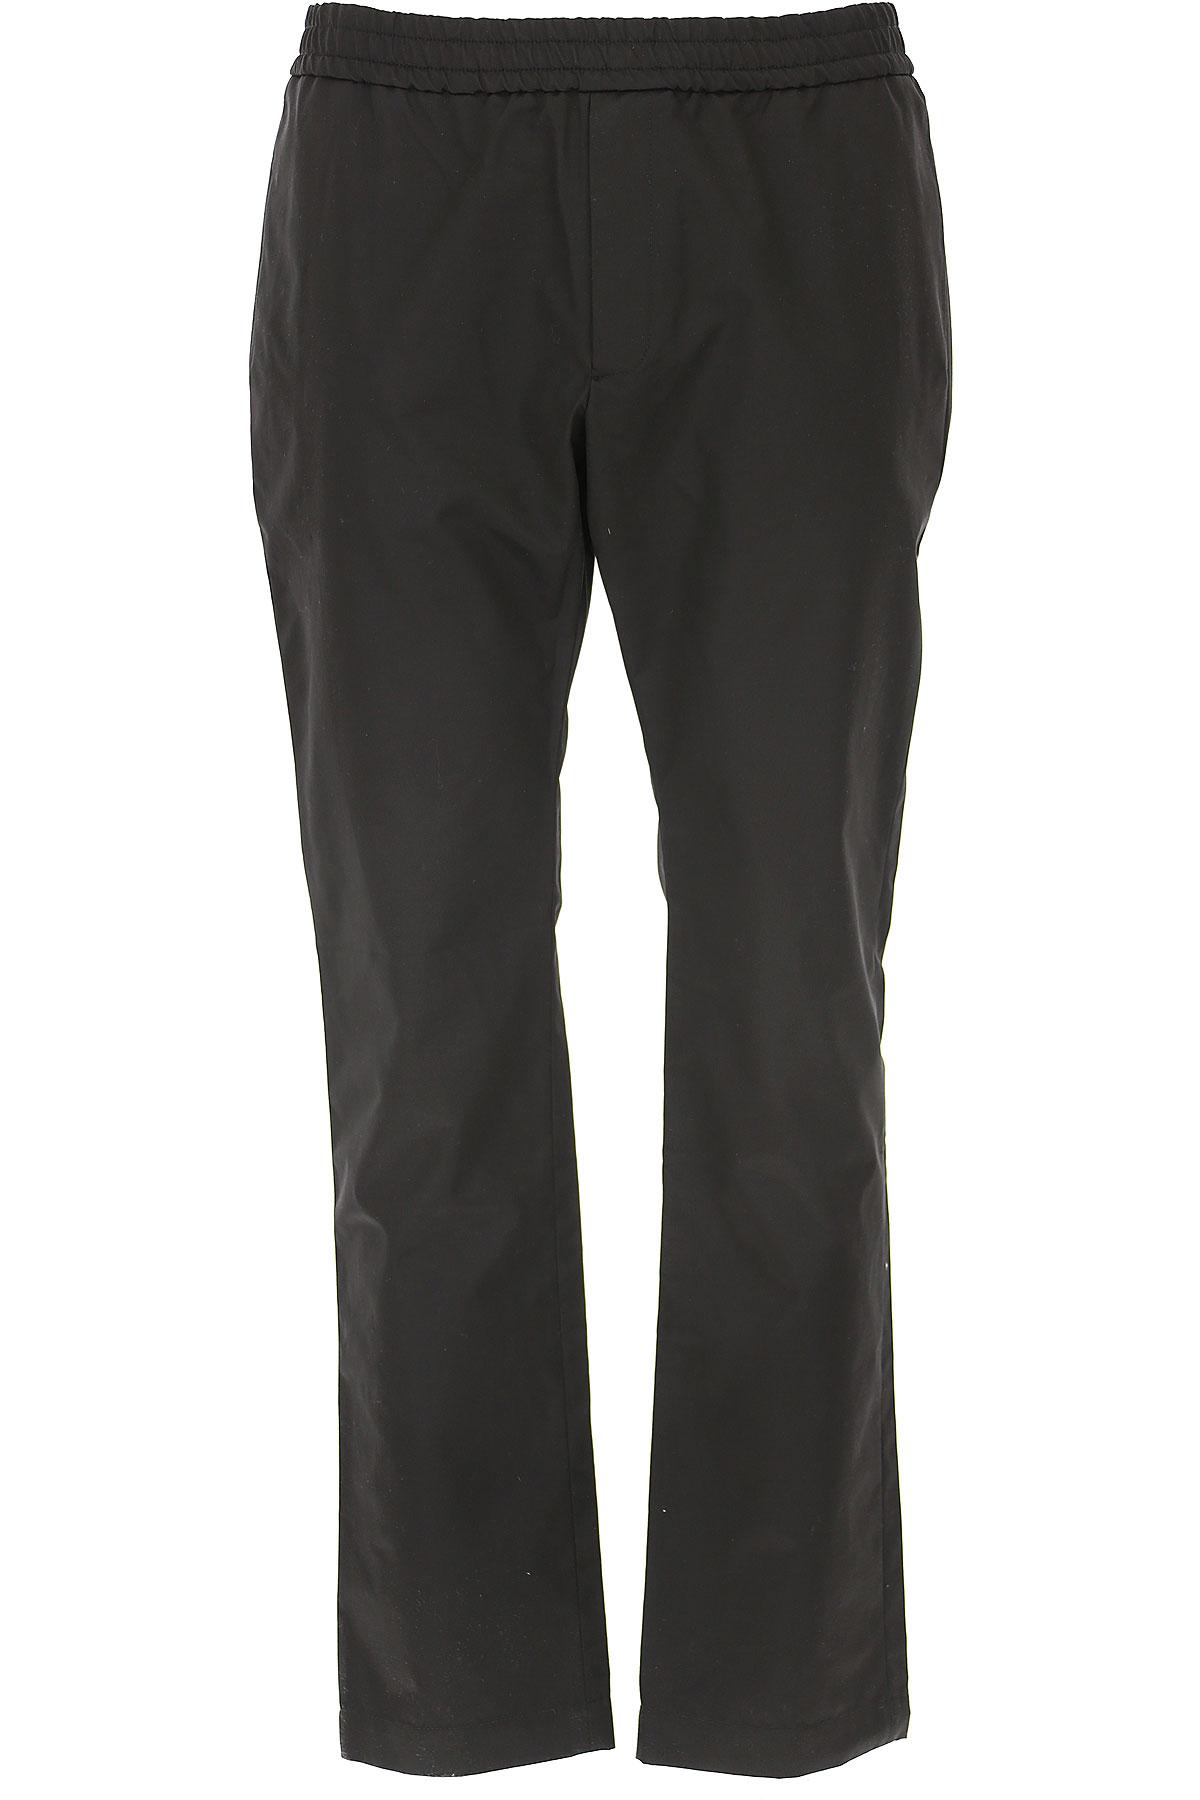 ALYX Pants for Men On Sale in Outlet, Black, poliammide, 2019, L (EU 50) M (EU 48)